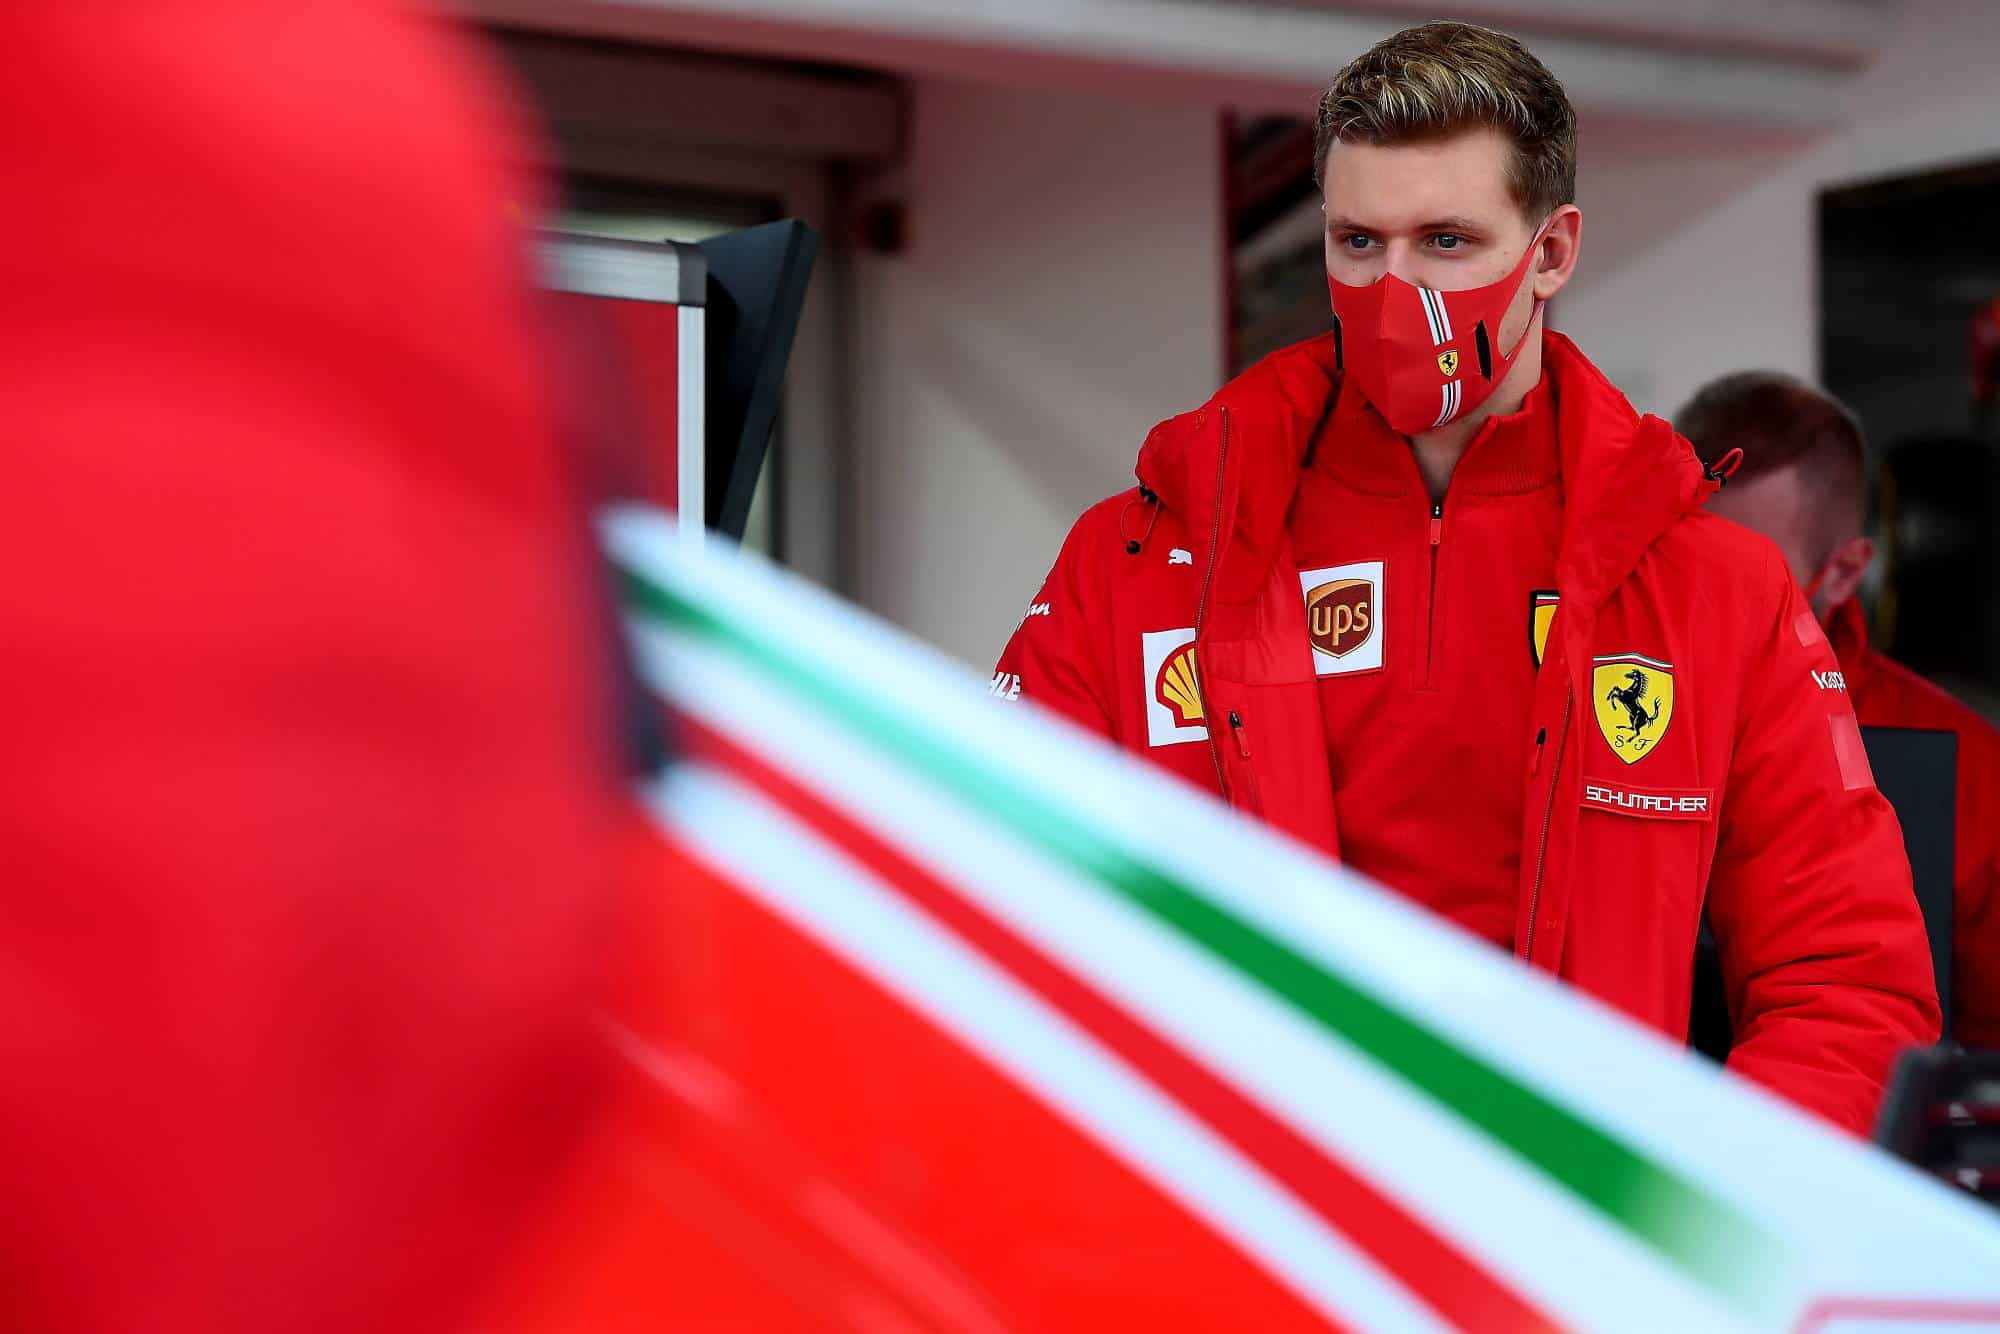 2021 Fiorano Mick Schumacher in pits Fiorano Ferrari SF71H 2018 on Thu 28 Jan 2021 Photo Ferrari